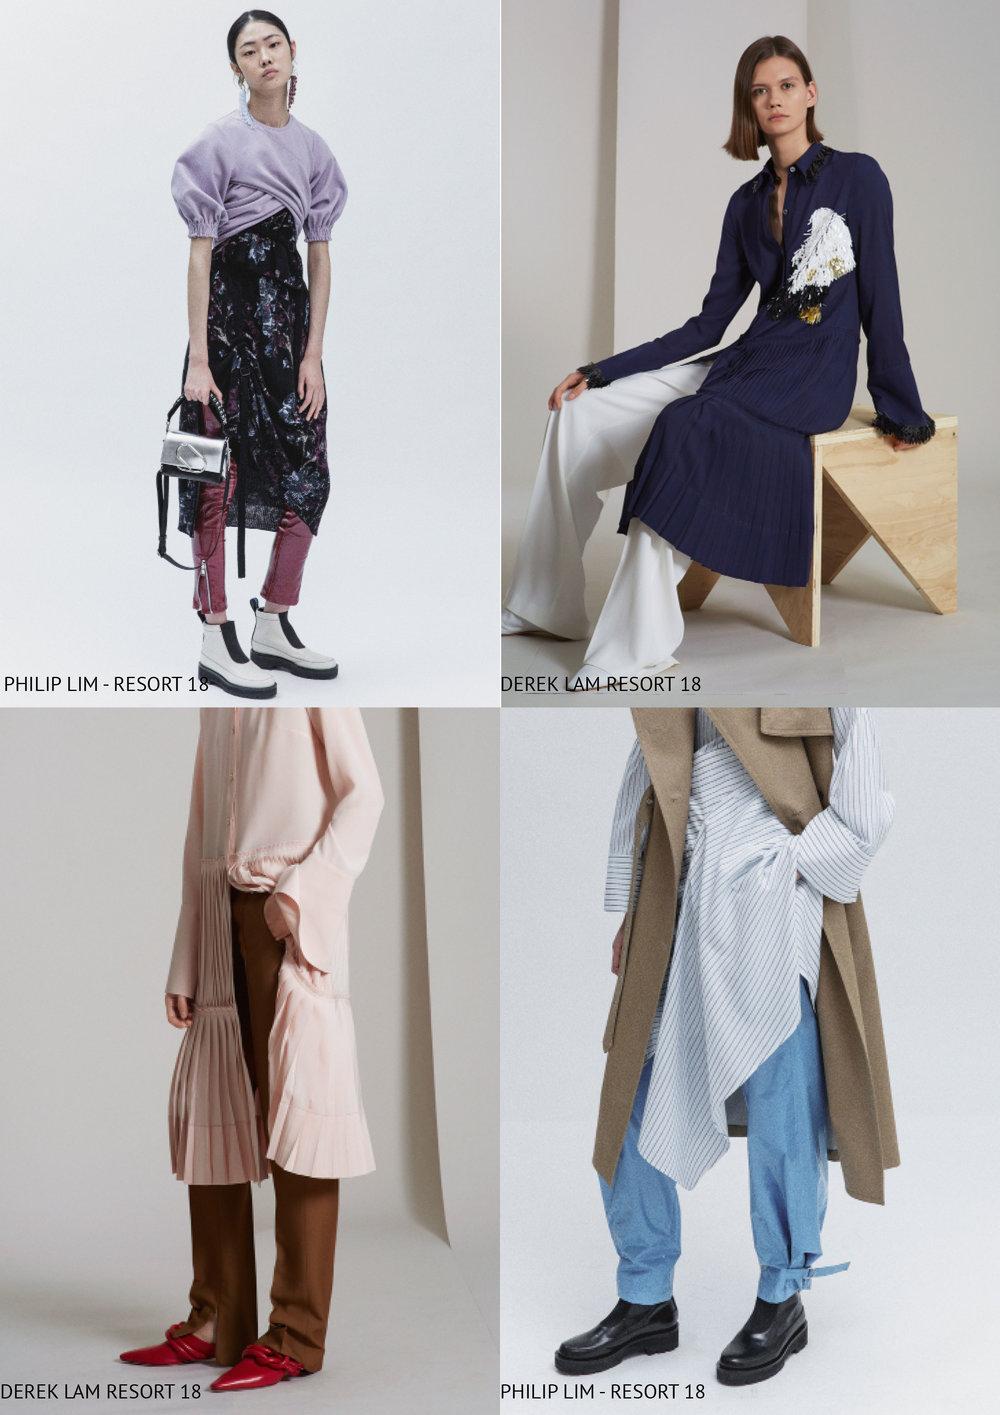 resort 2018 trousers worn under dress.jpg